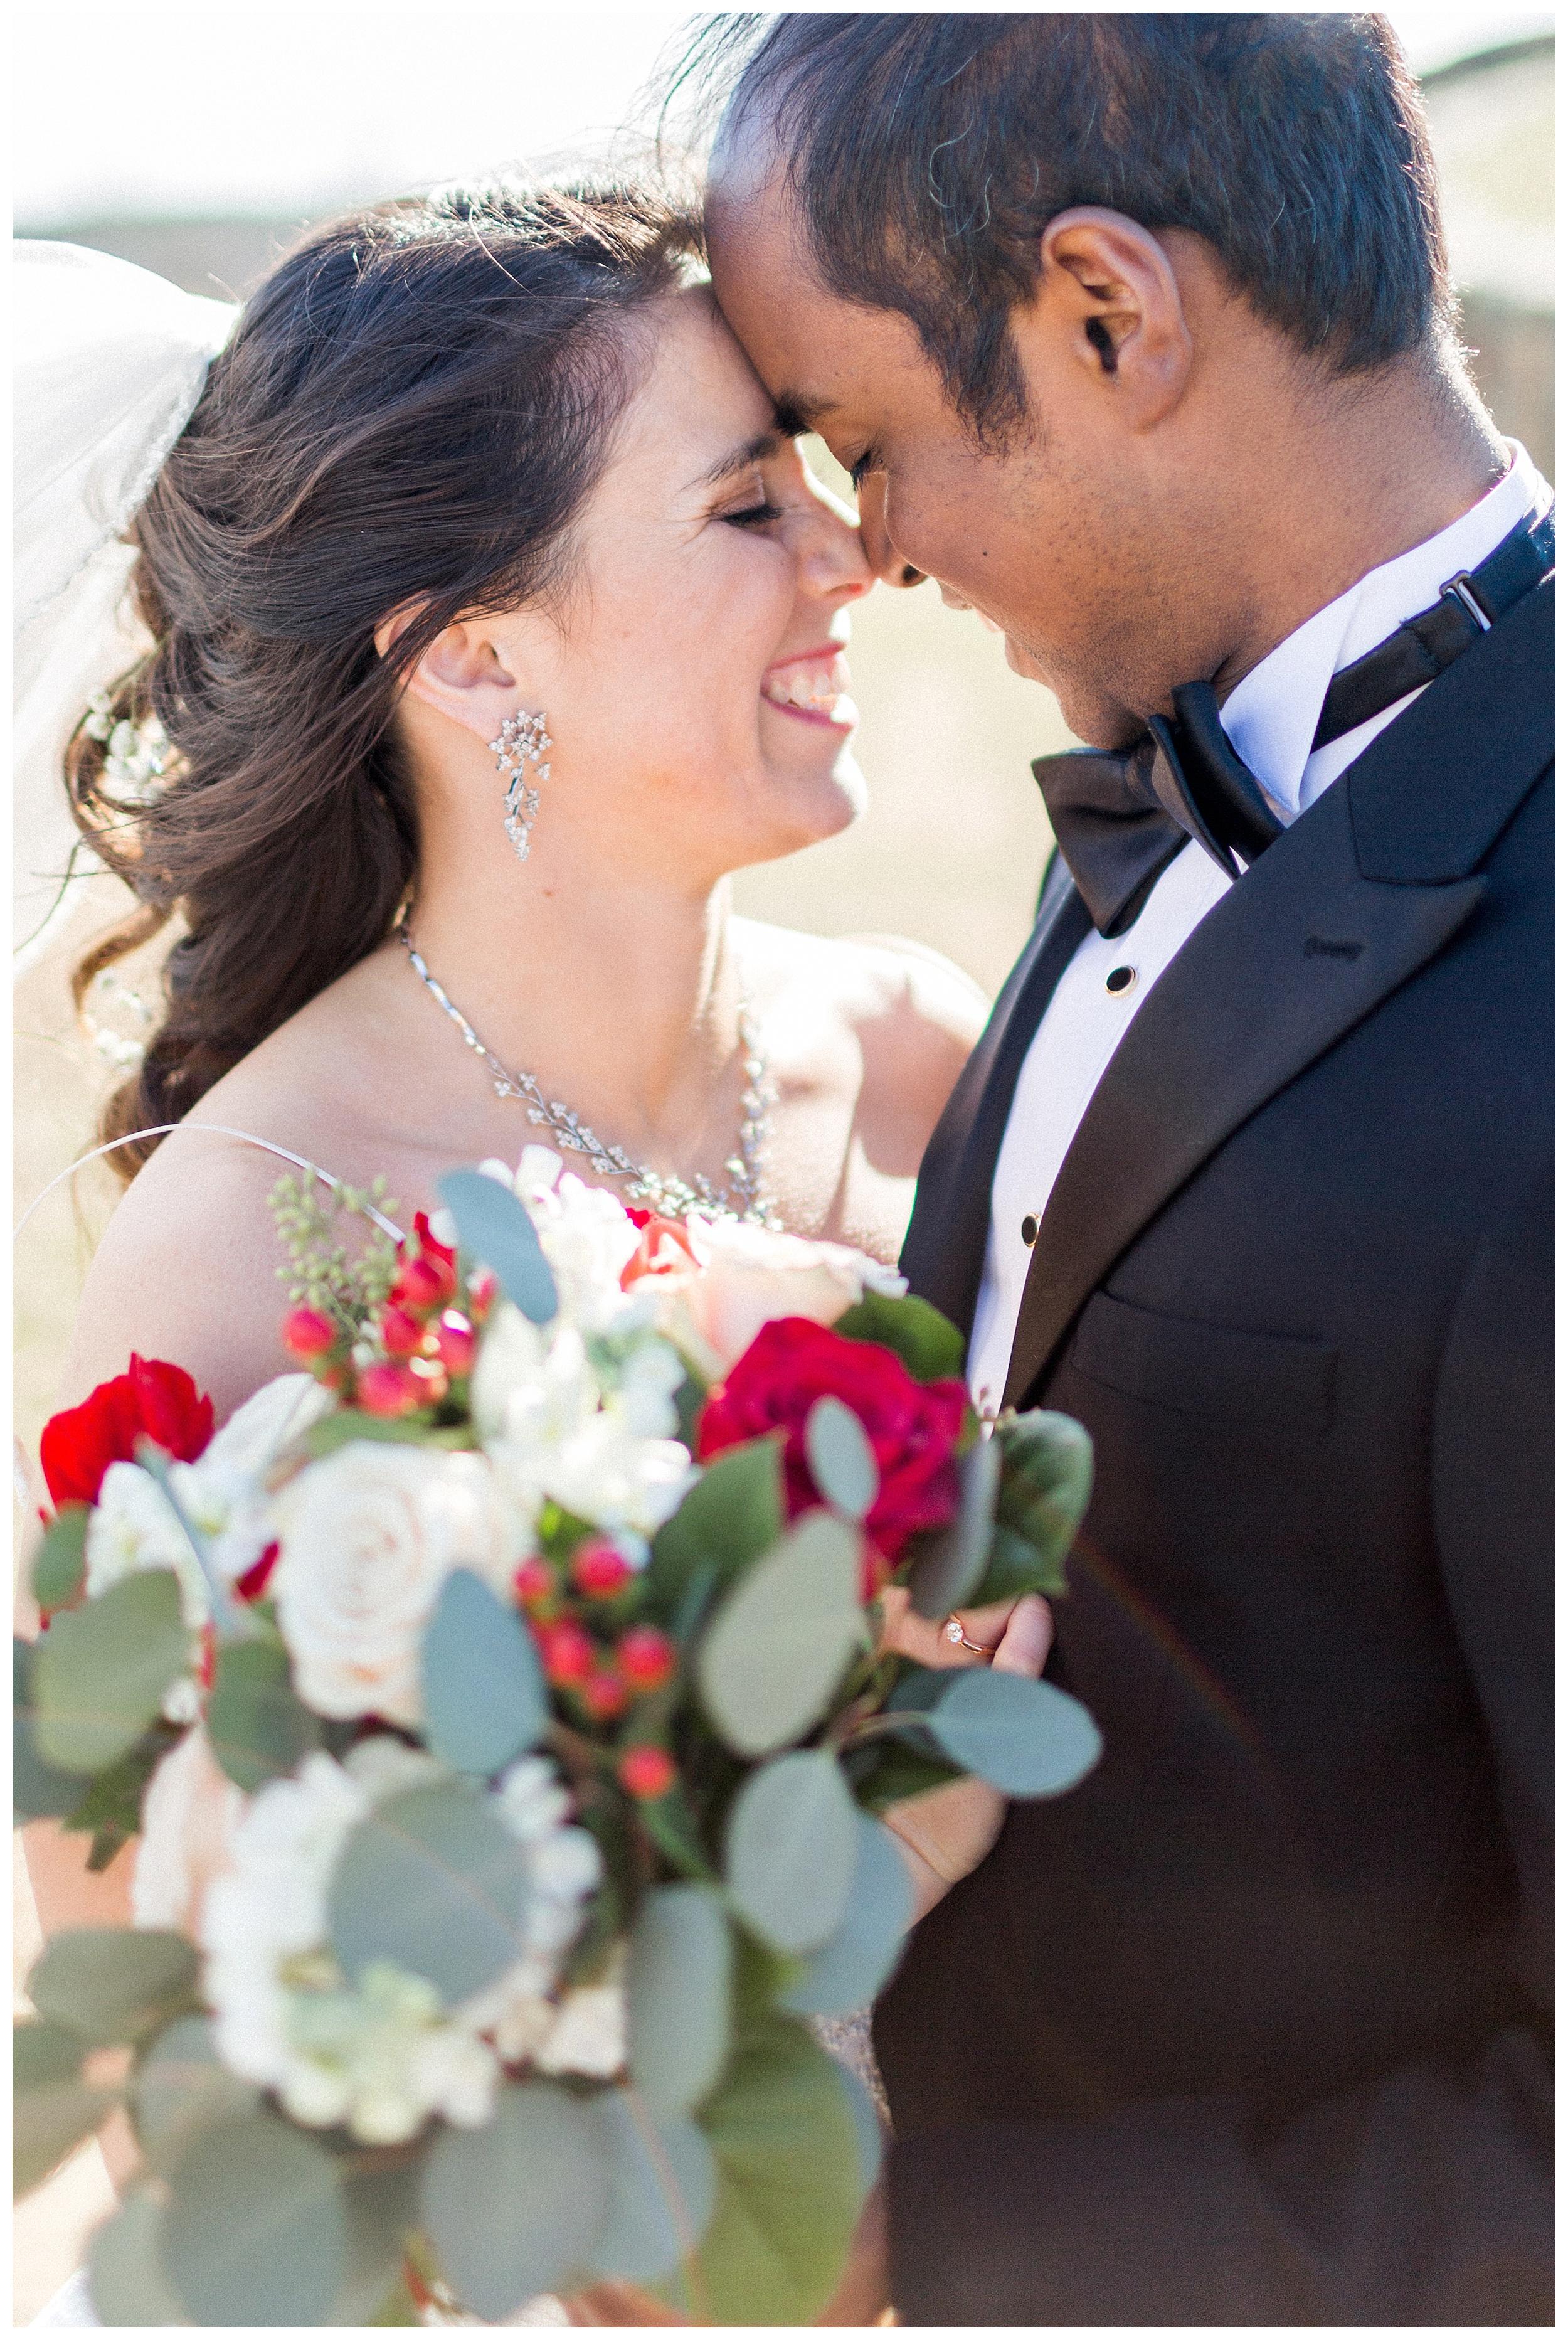 Stone Tower Winery Wedding | Virginia Winter Wedding | VA Wedding Photographer Kir Tuben_0054.jpg